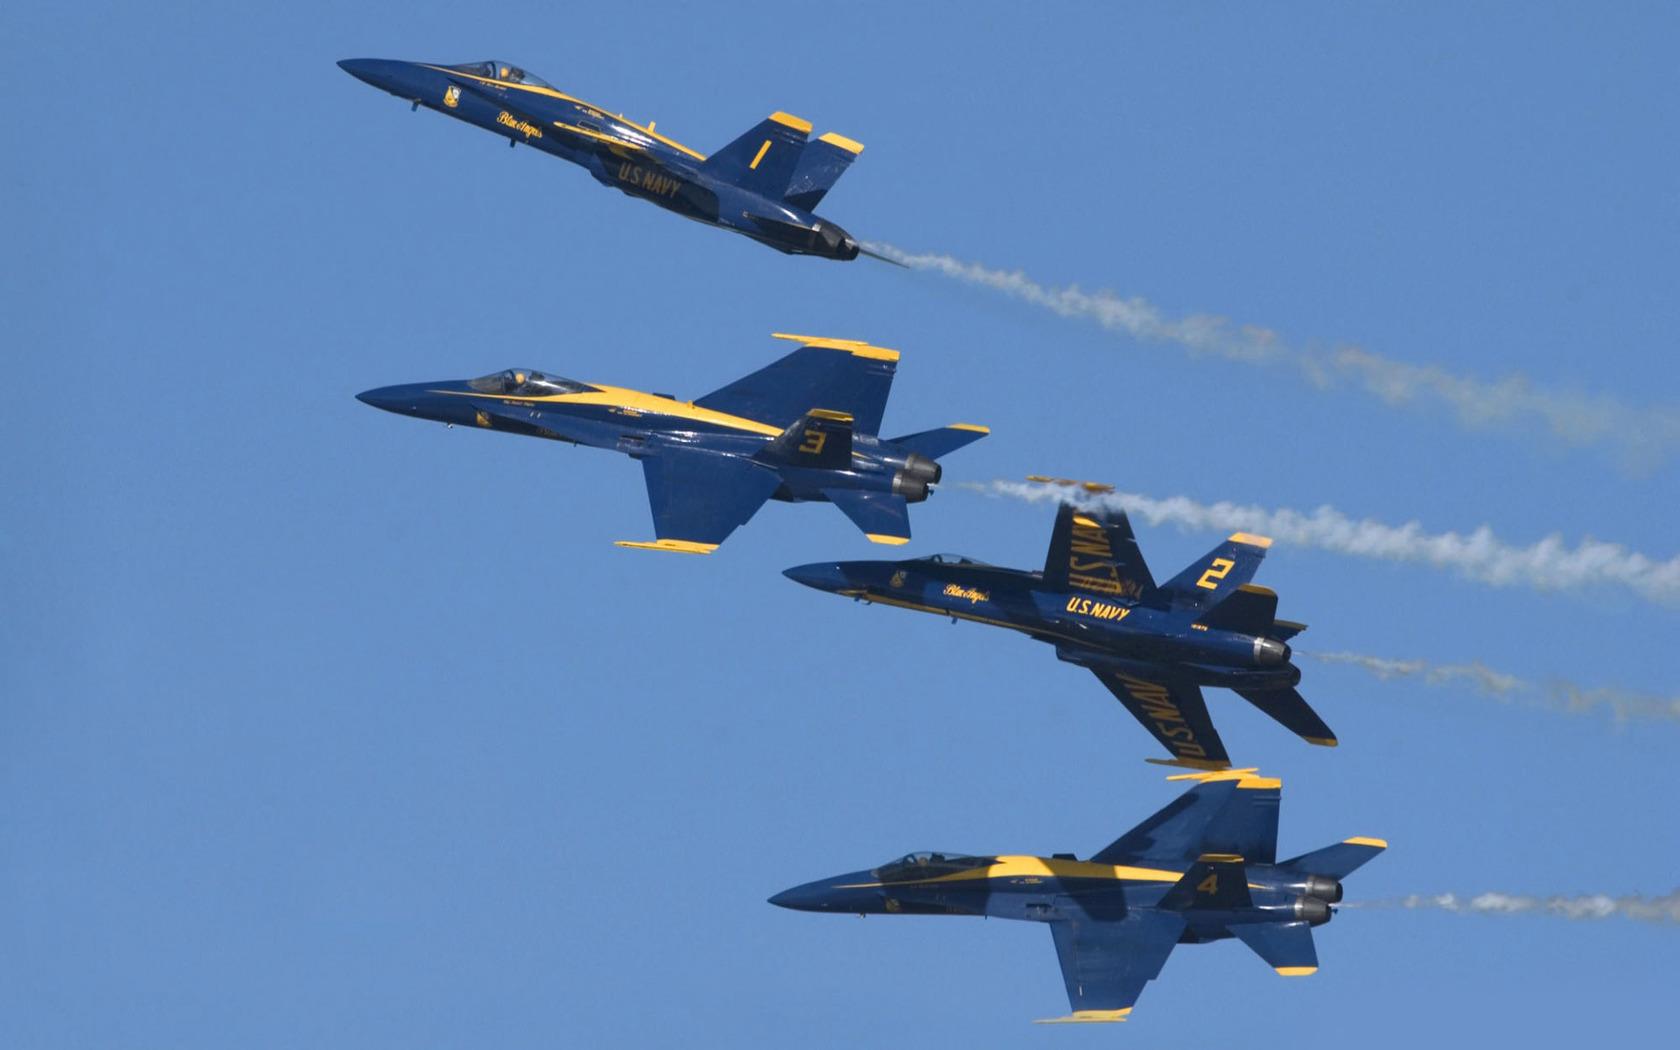 Download The Blue Angels McDonnell Douglas FA 18 Hornets wallpaper 1680x1050